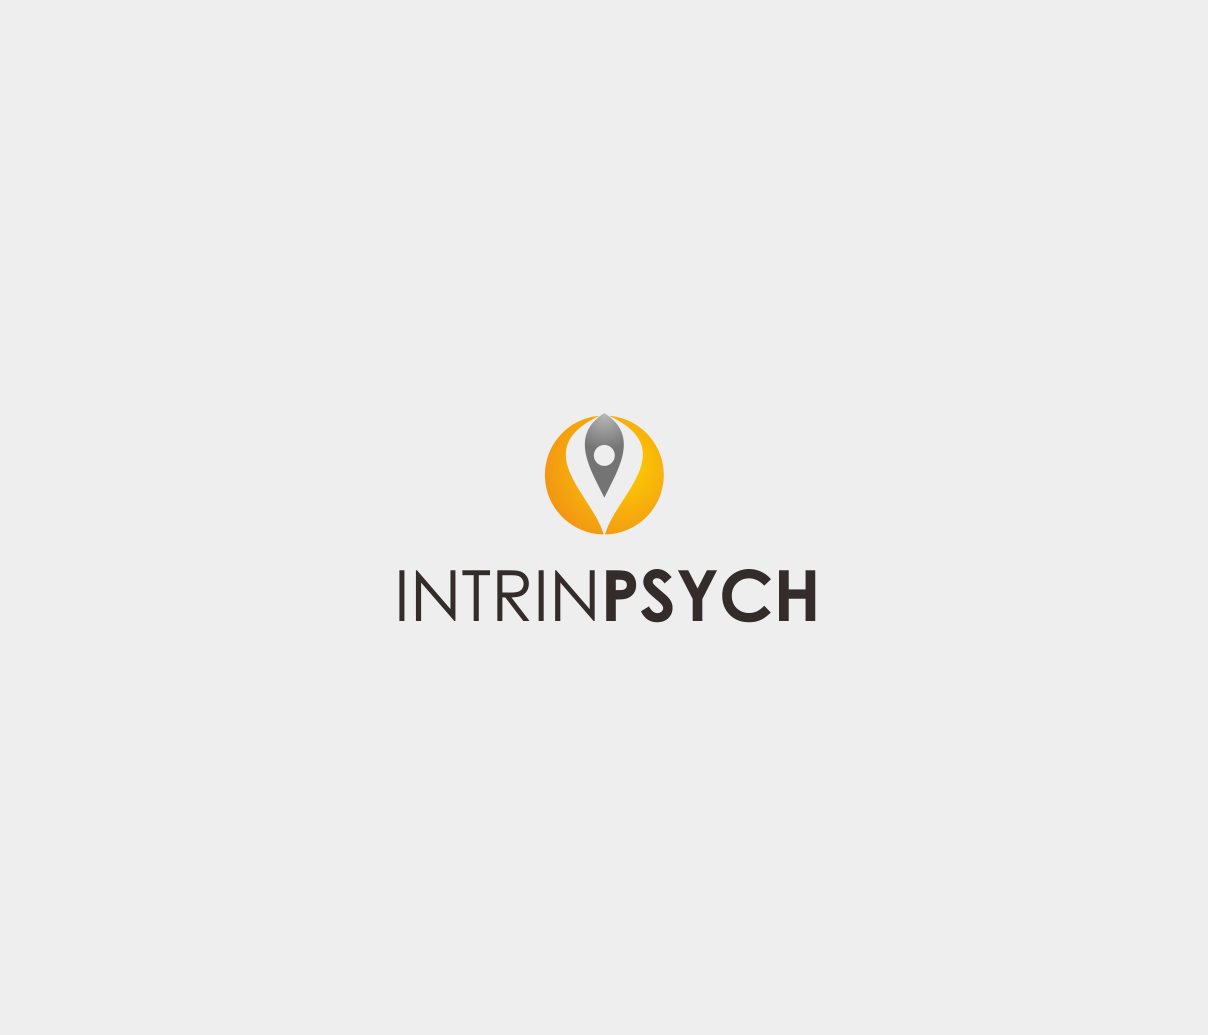 Logo Design by Armada Jamaluddin - Entry No. 184 in the Logo Design Contest New Logo Design for IntrinPsych.